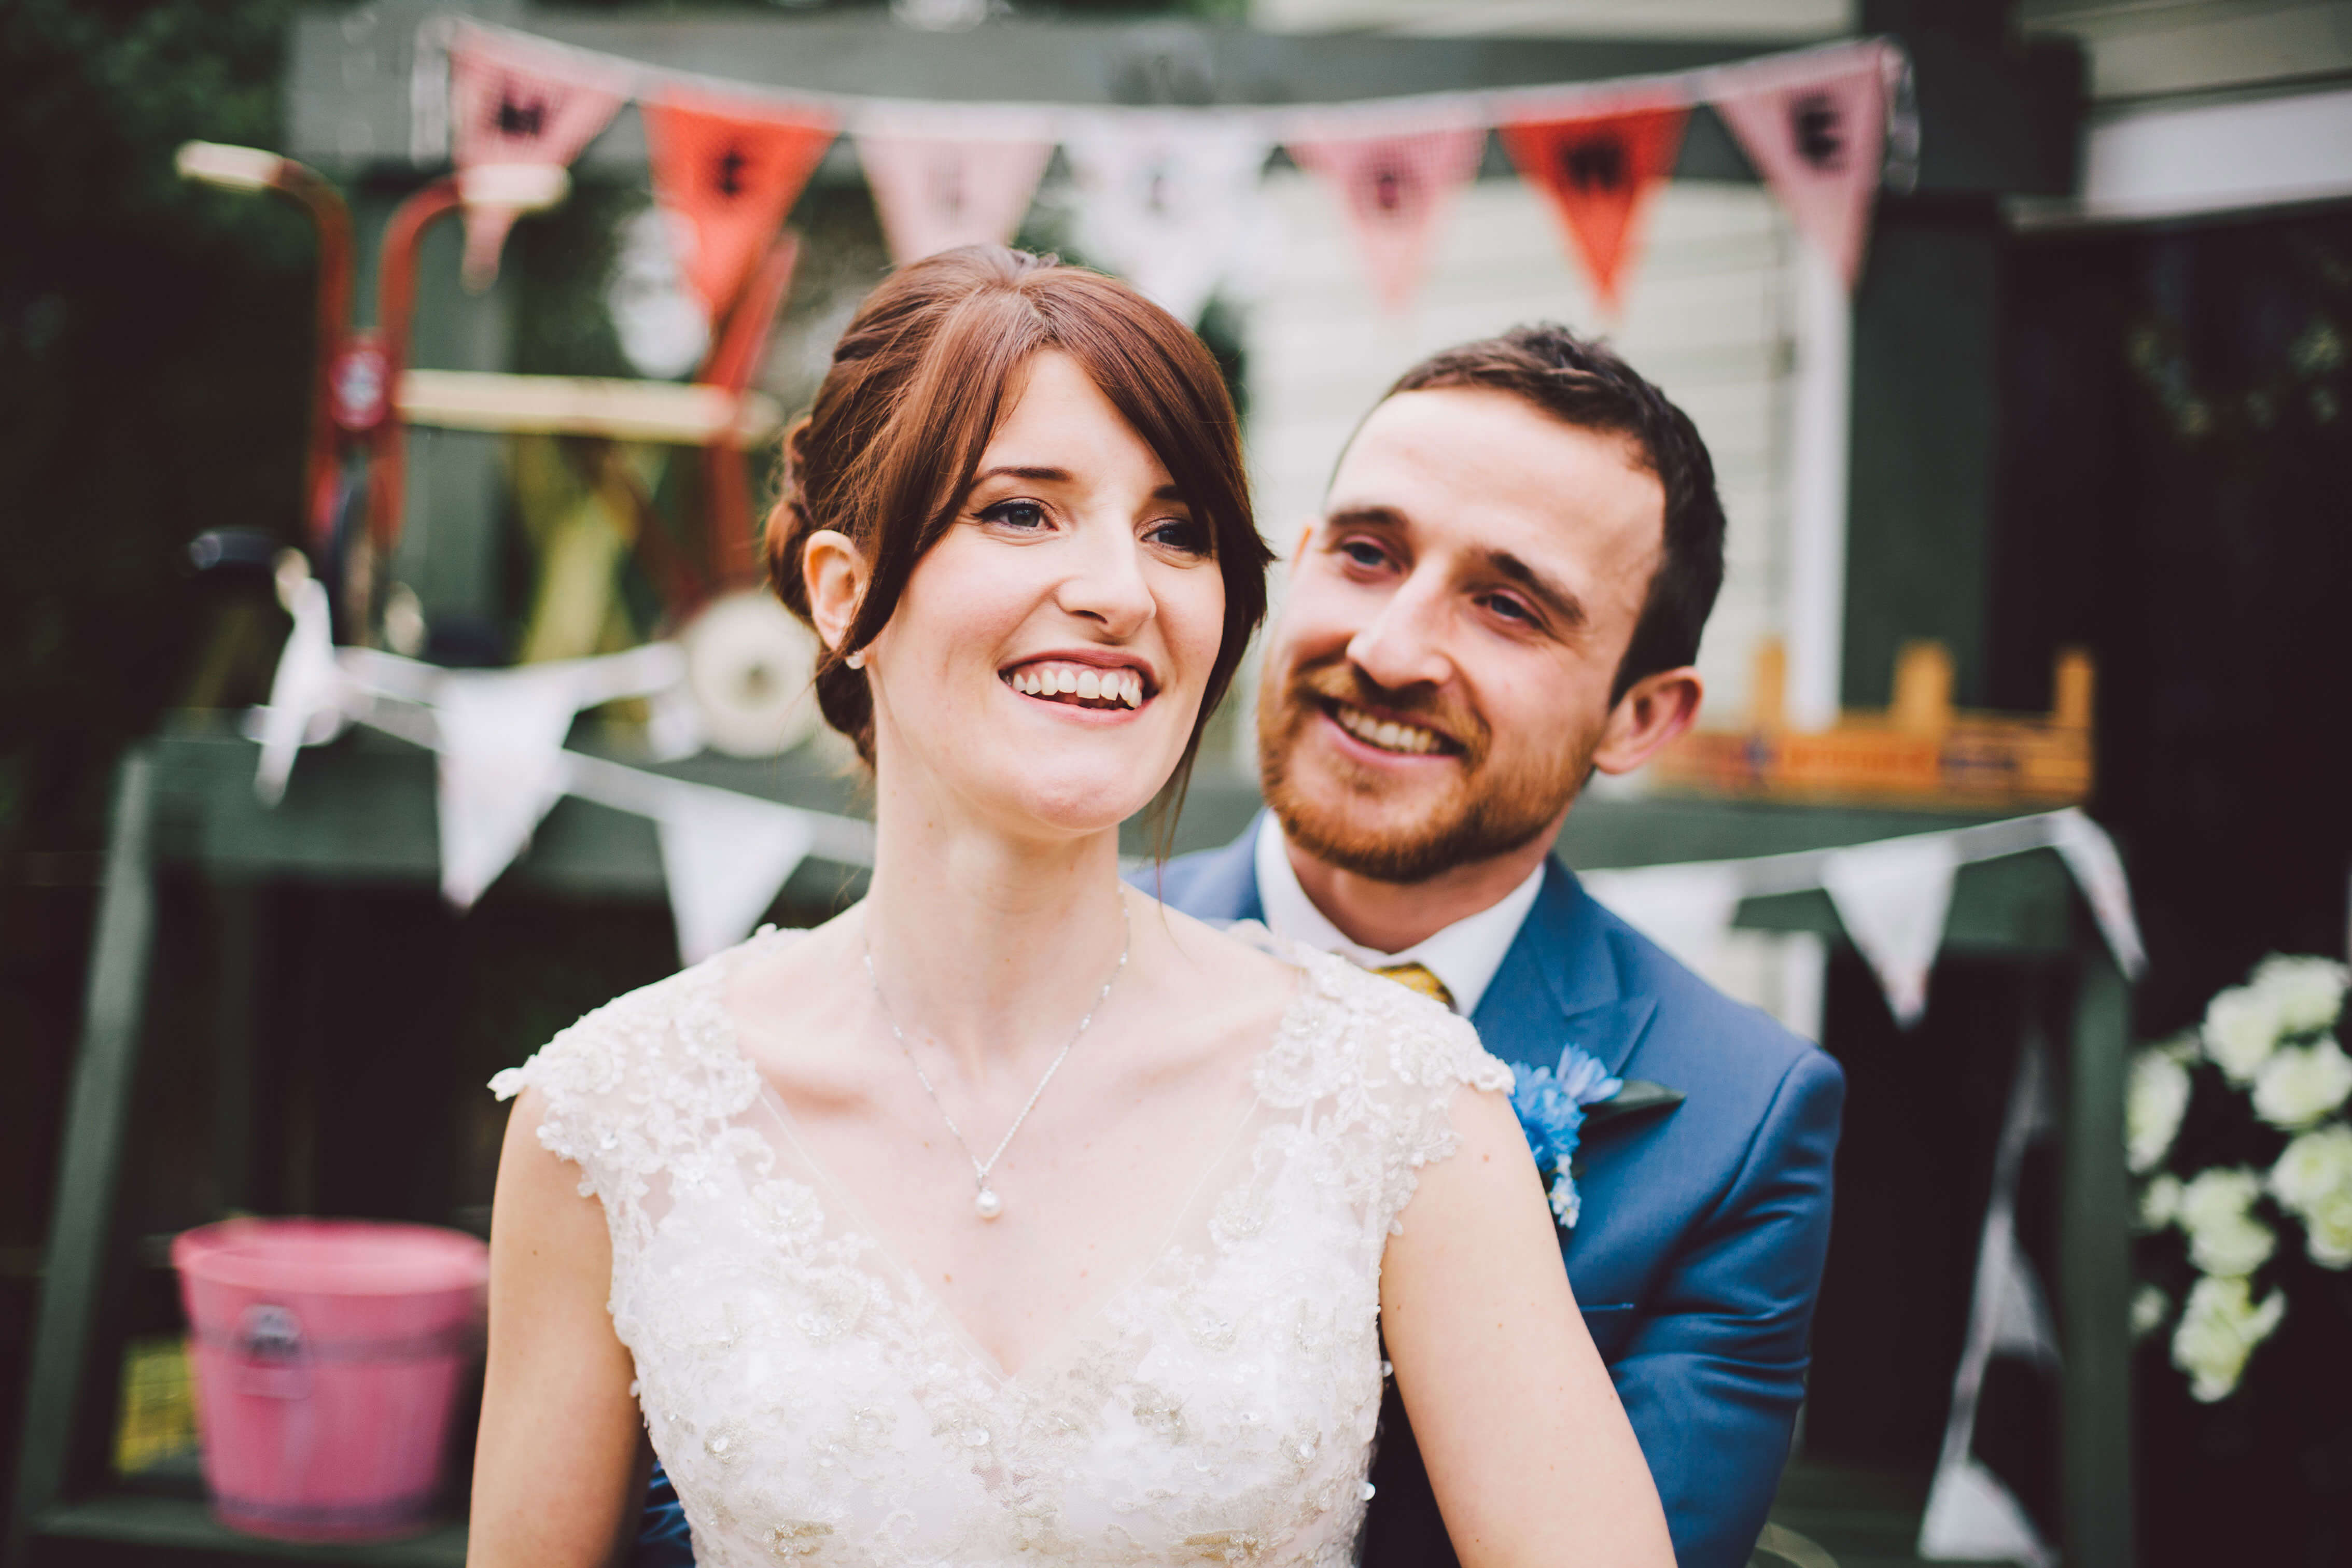 Rainbow themed wedding with couple